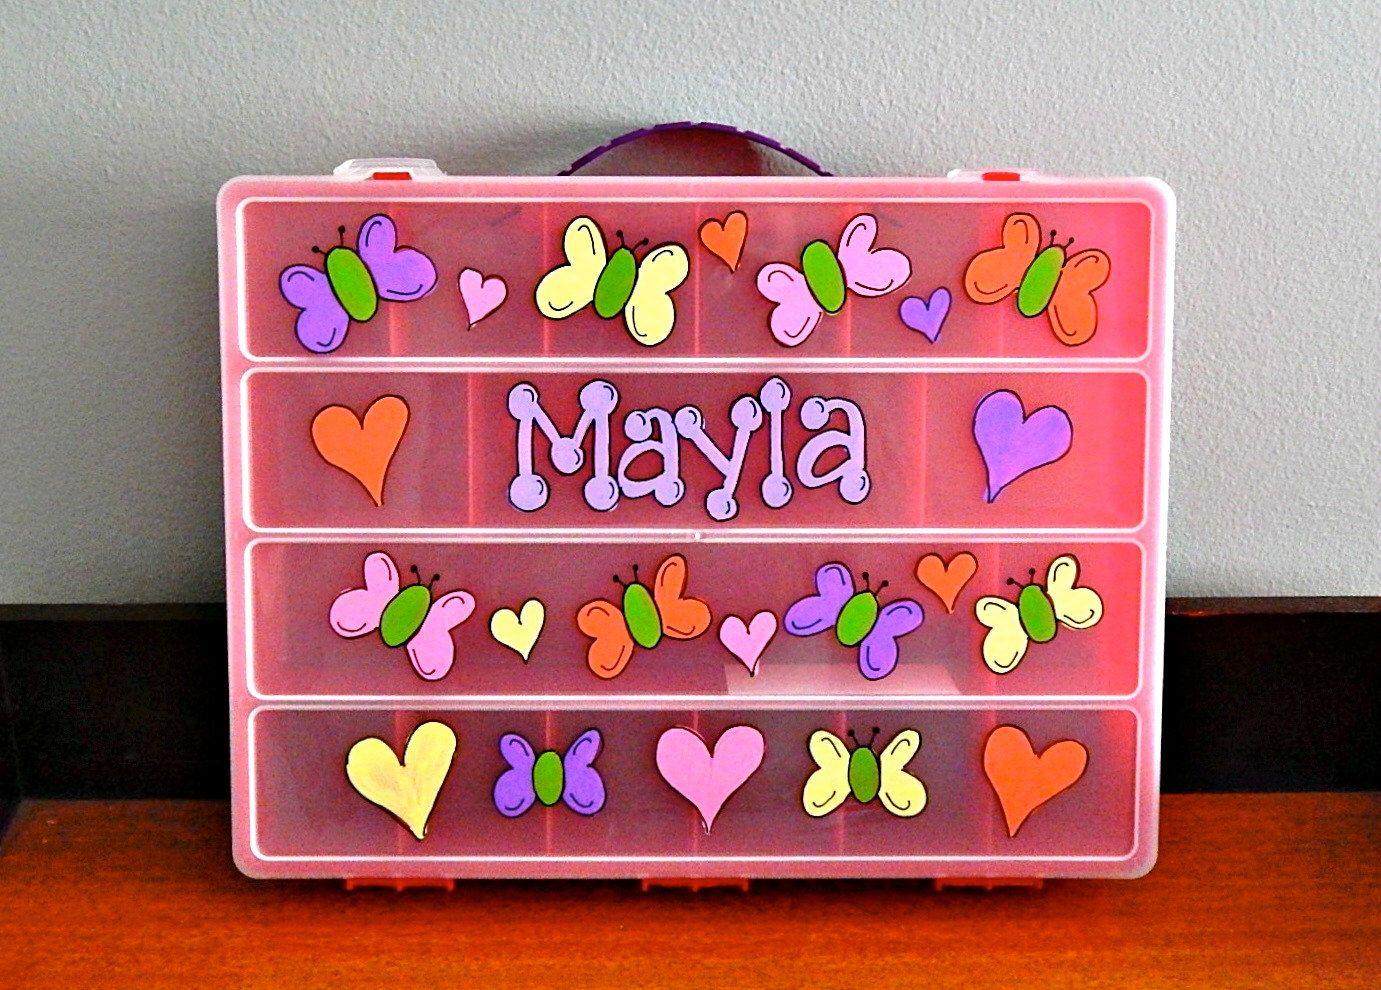 Pink Organizer Box - Rainbow Loom, Shopkins, Yummies, Lego, Beads & First Aid Supplies by ArtworksByAmy on Etsy https://www.etsy.com/listing/203296915/pink-organizer-box-rainbow-loom-shopkins